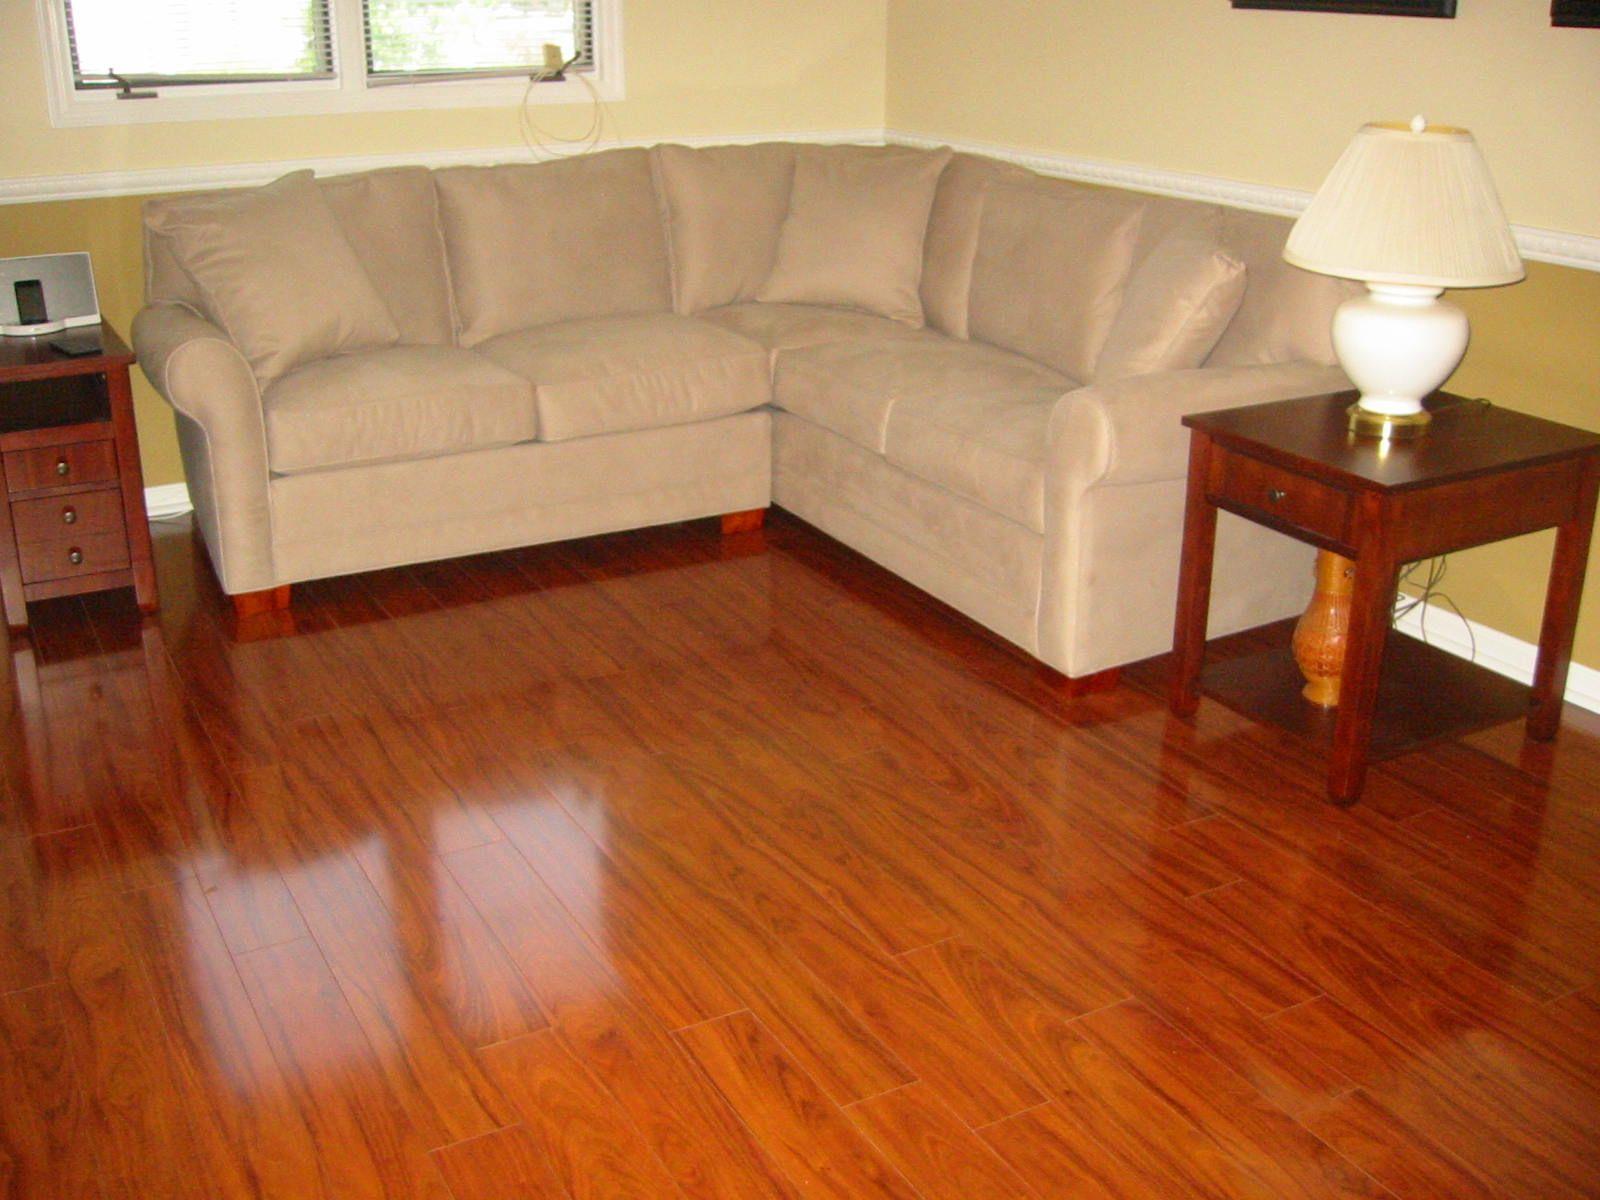 Hardwood flooring by aromaz home hardwoodrefinishing pinterest